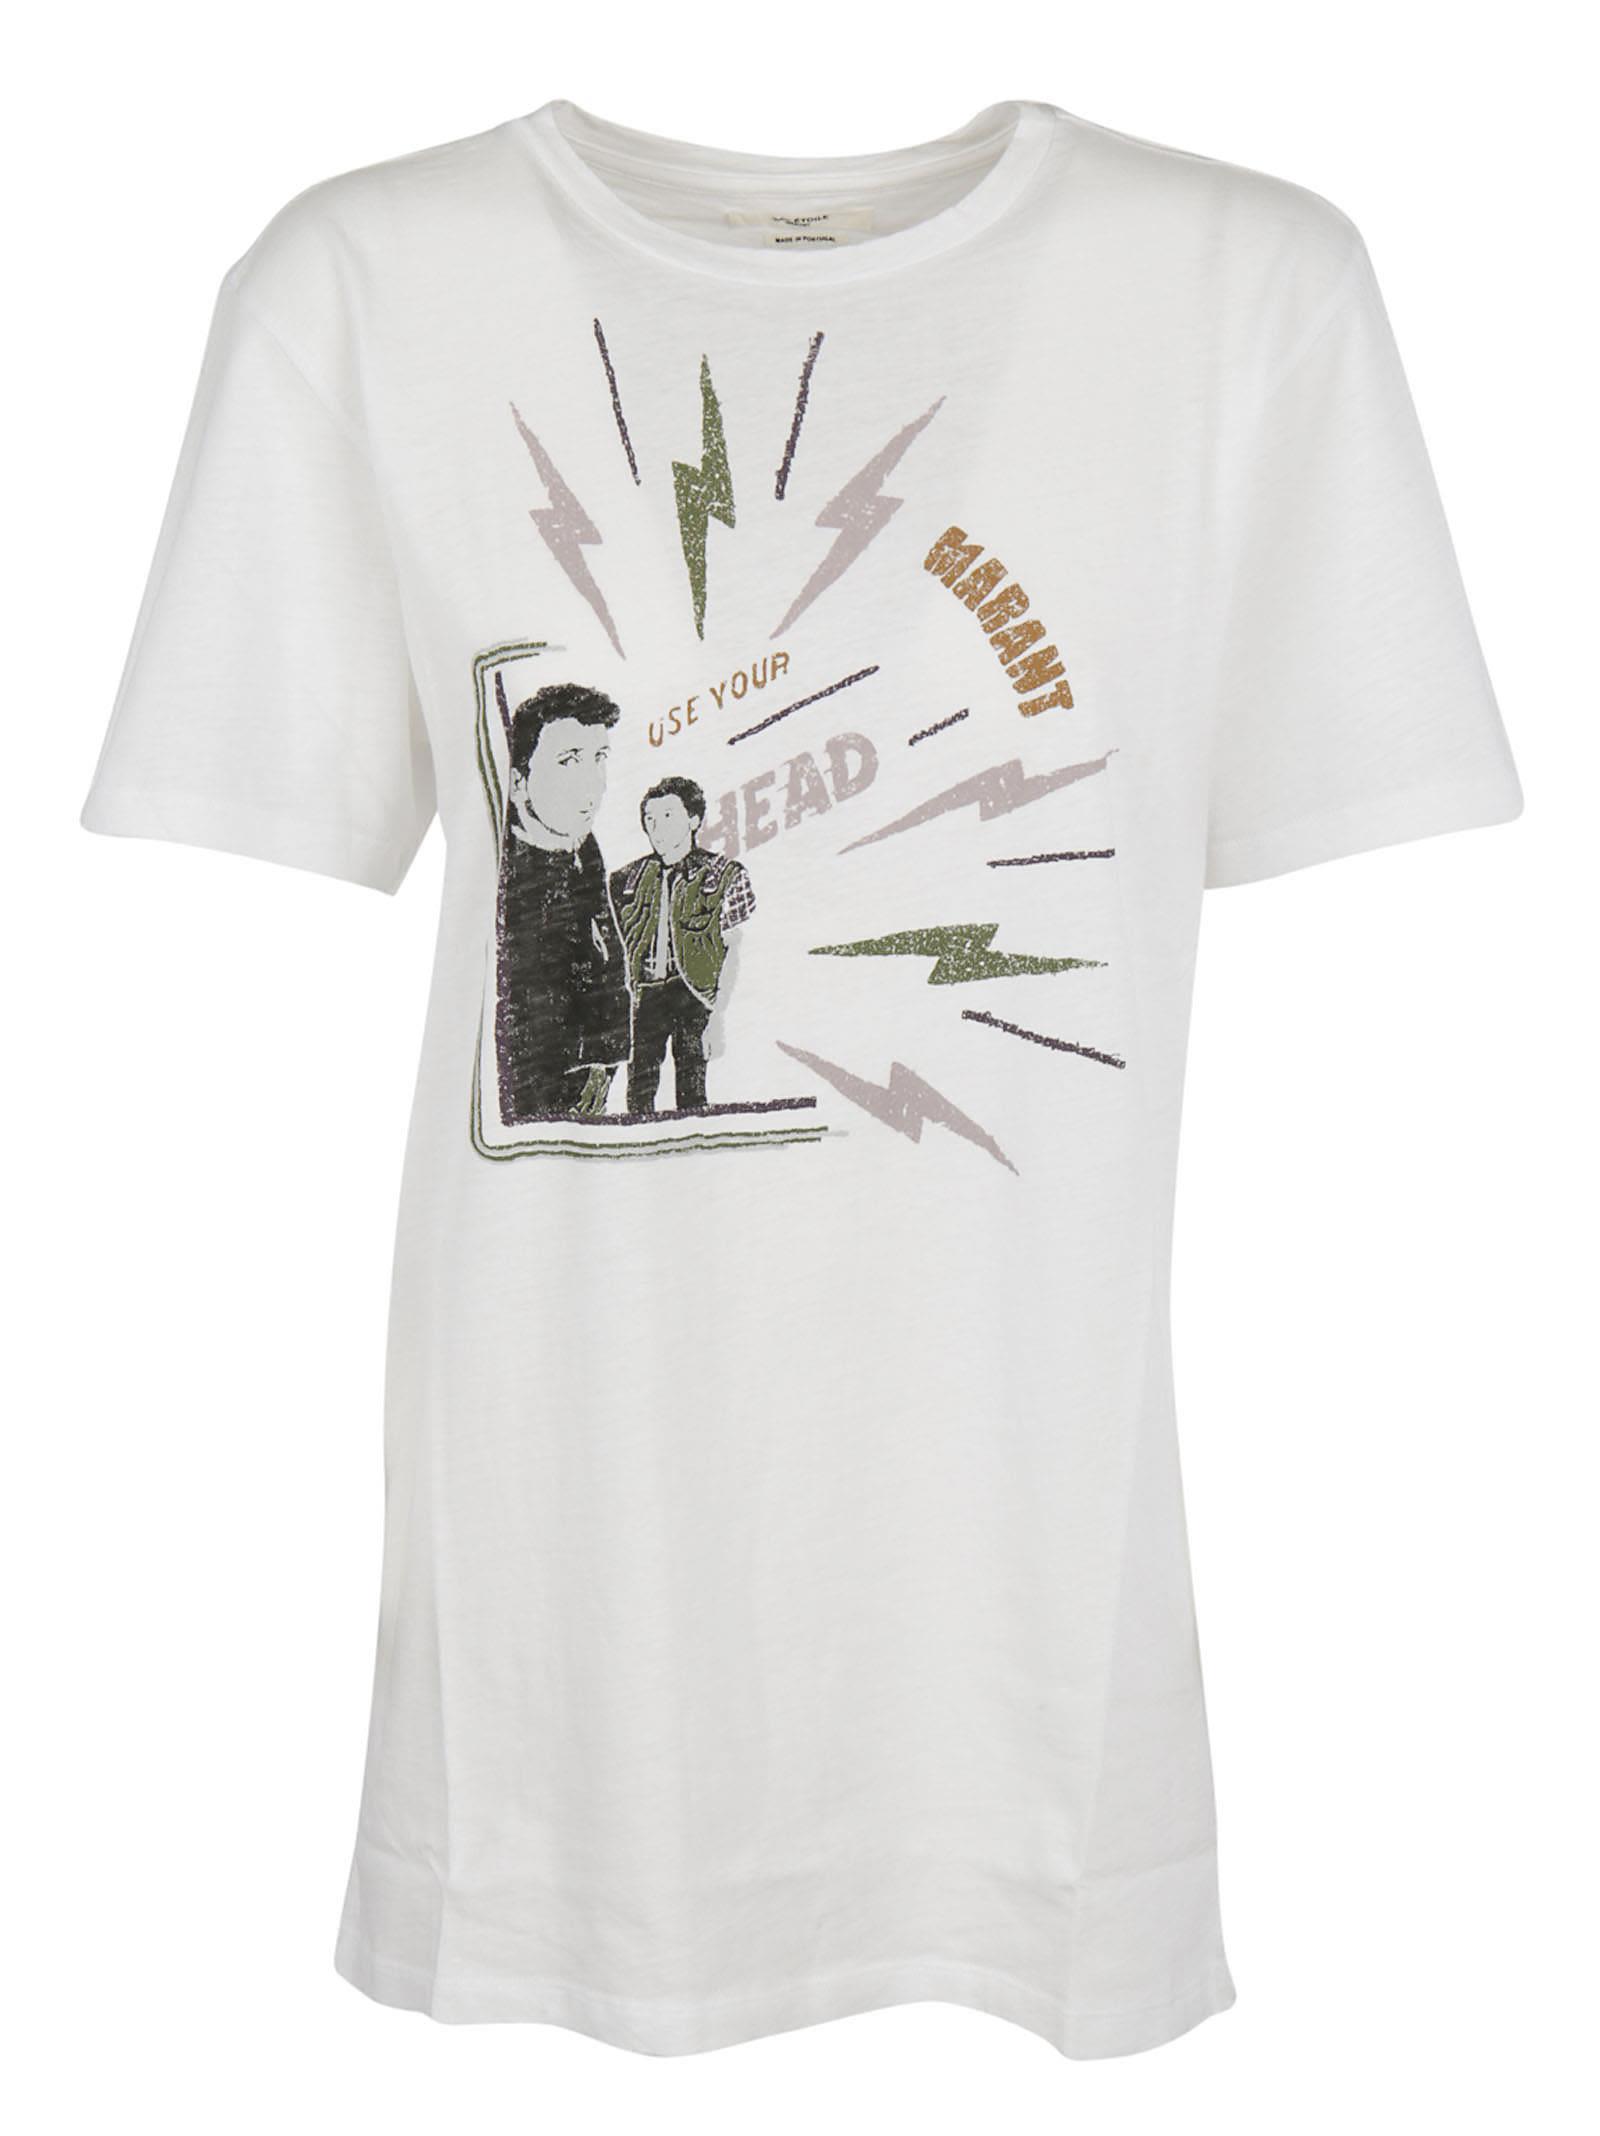 Isabel Marant Logo Print T Shirt Modesens